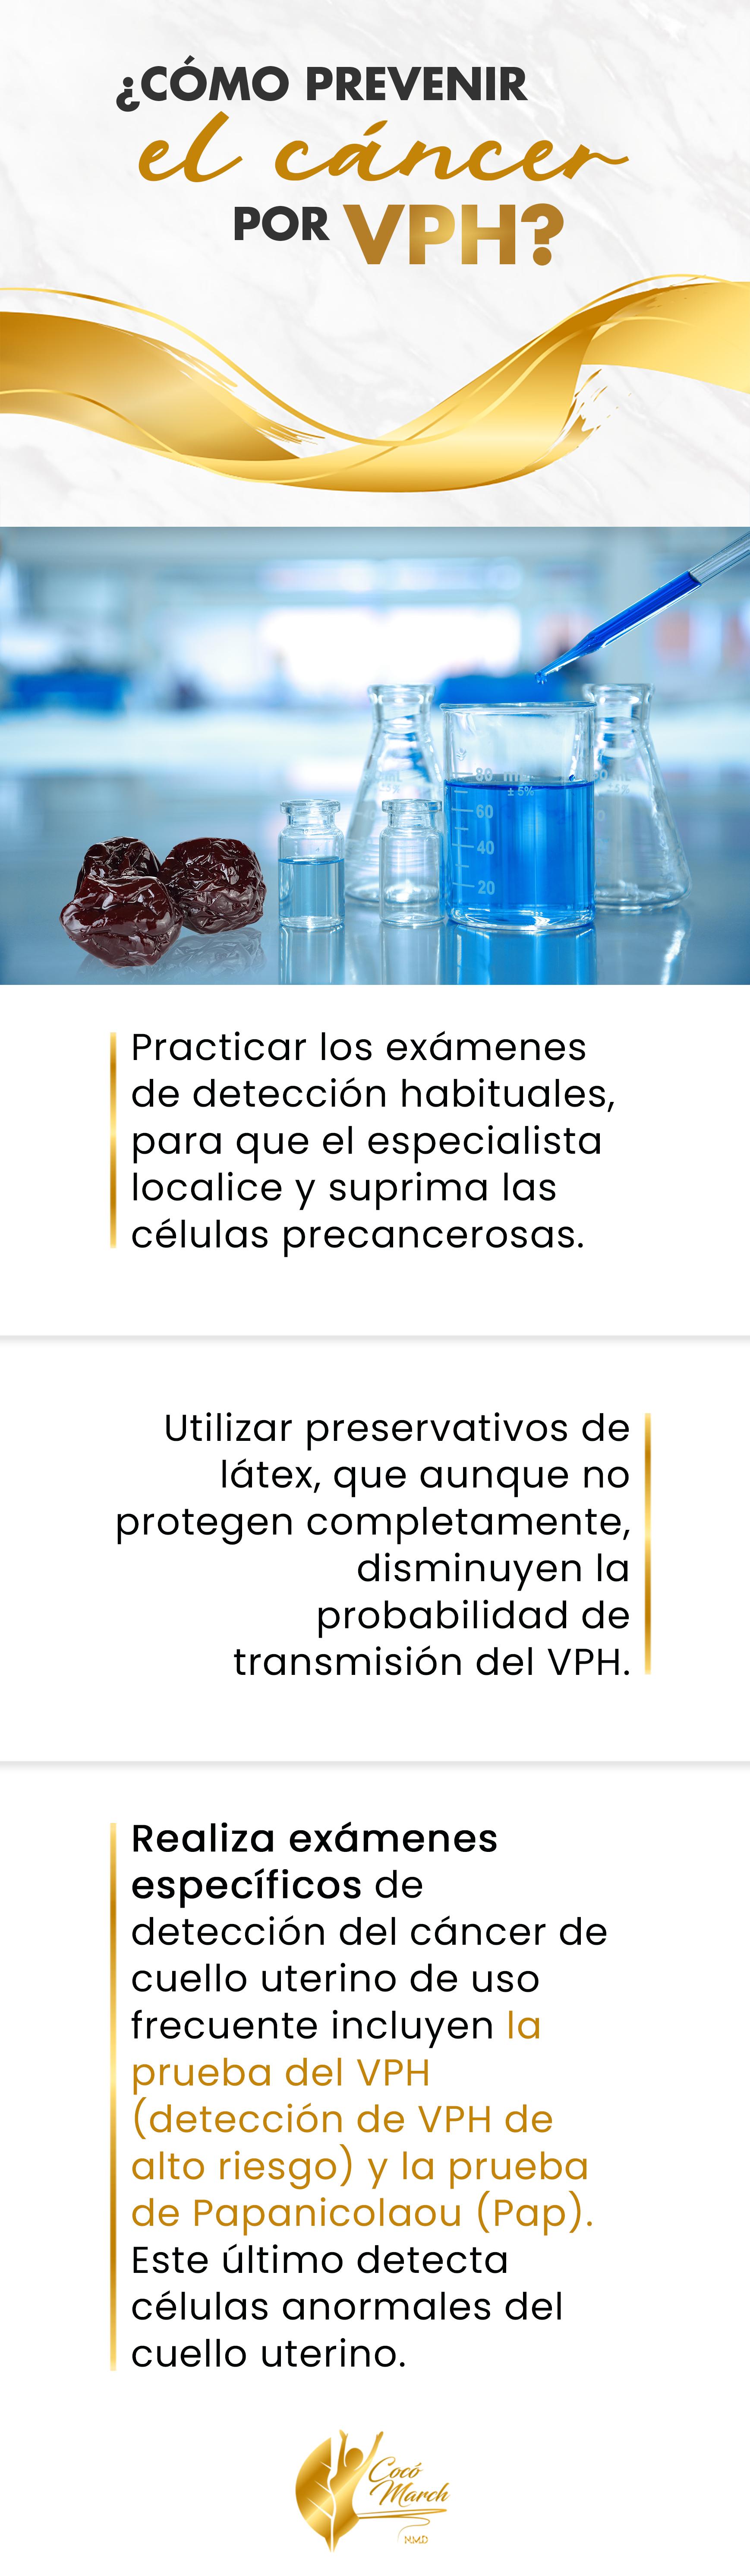 como-prevenir-el-cancer-por-vph